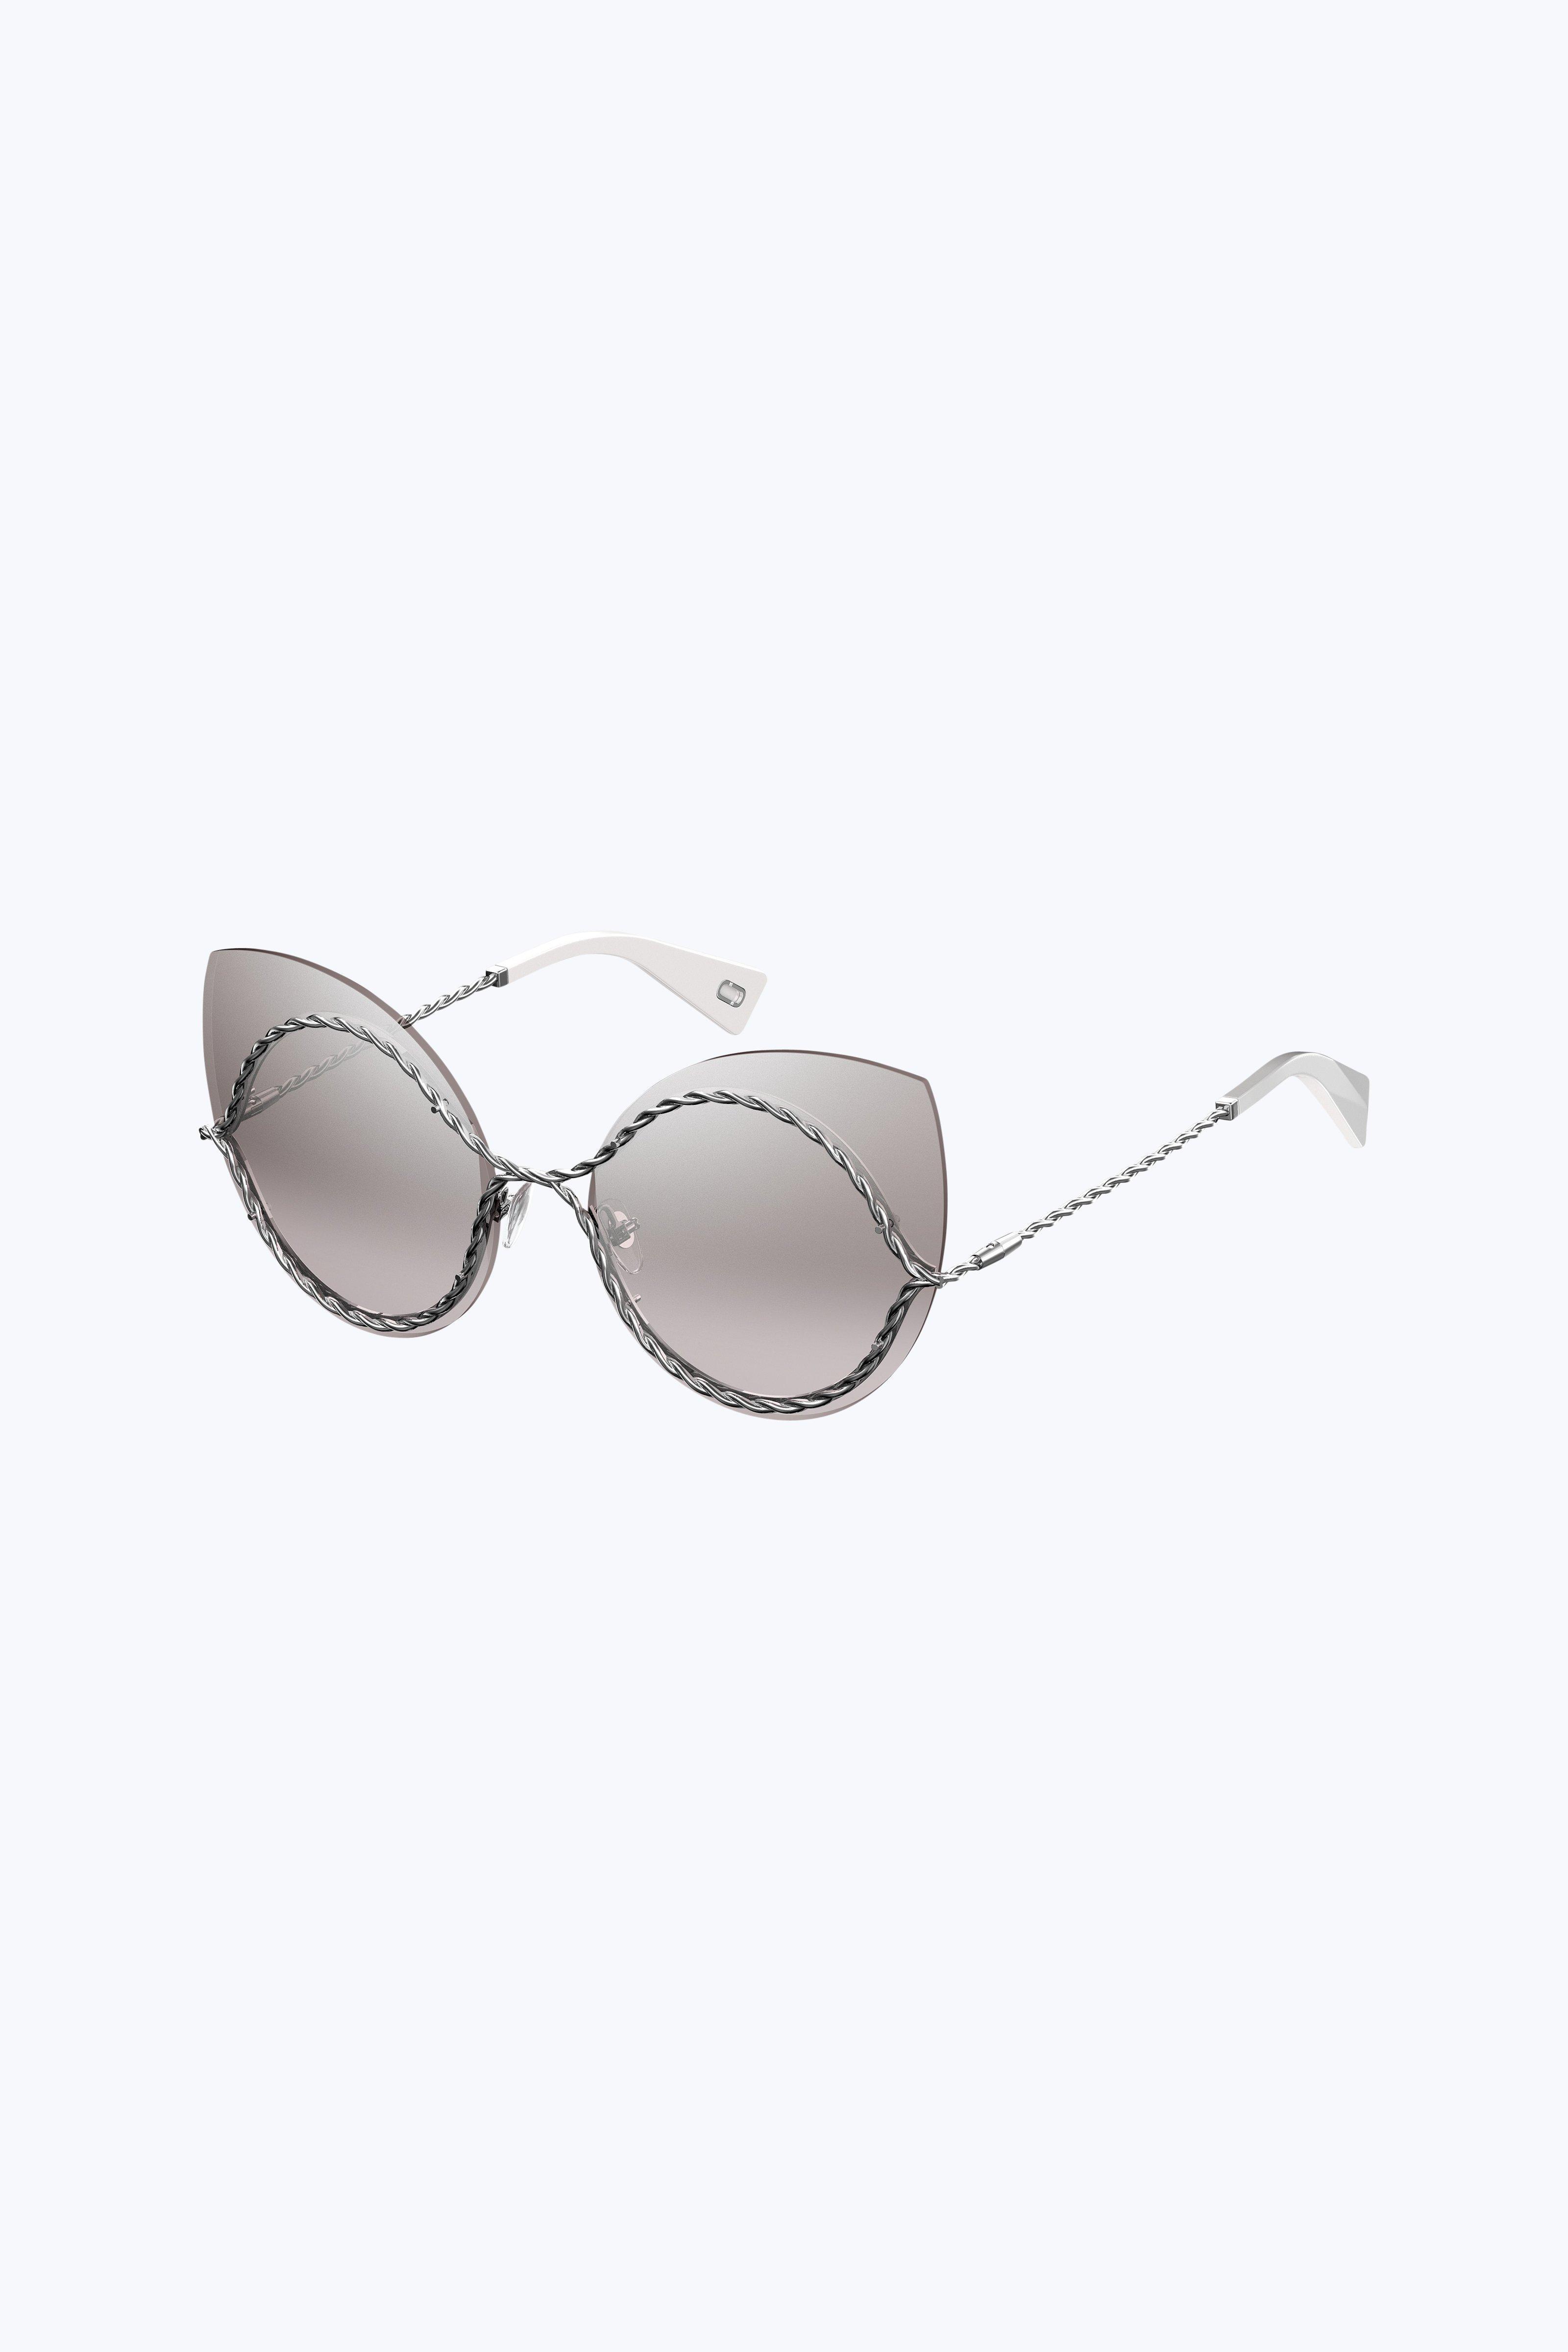 marc jacobs sunglasses  Metal Twist Sunglasses - Marc jacobs